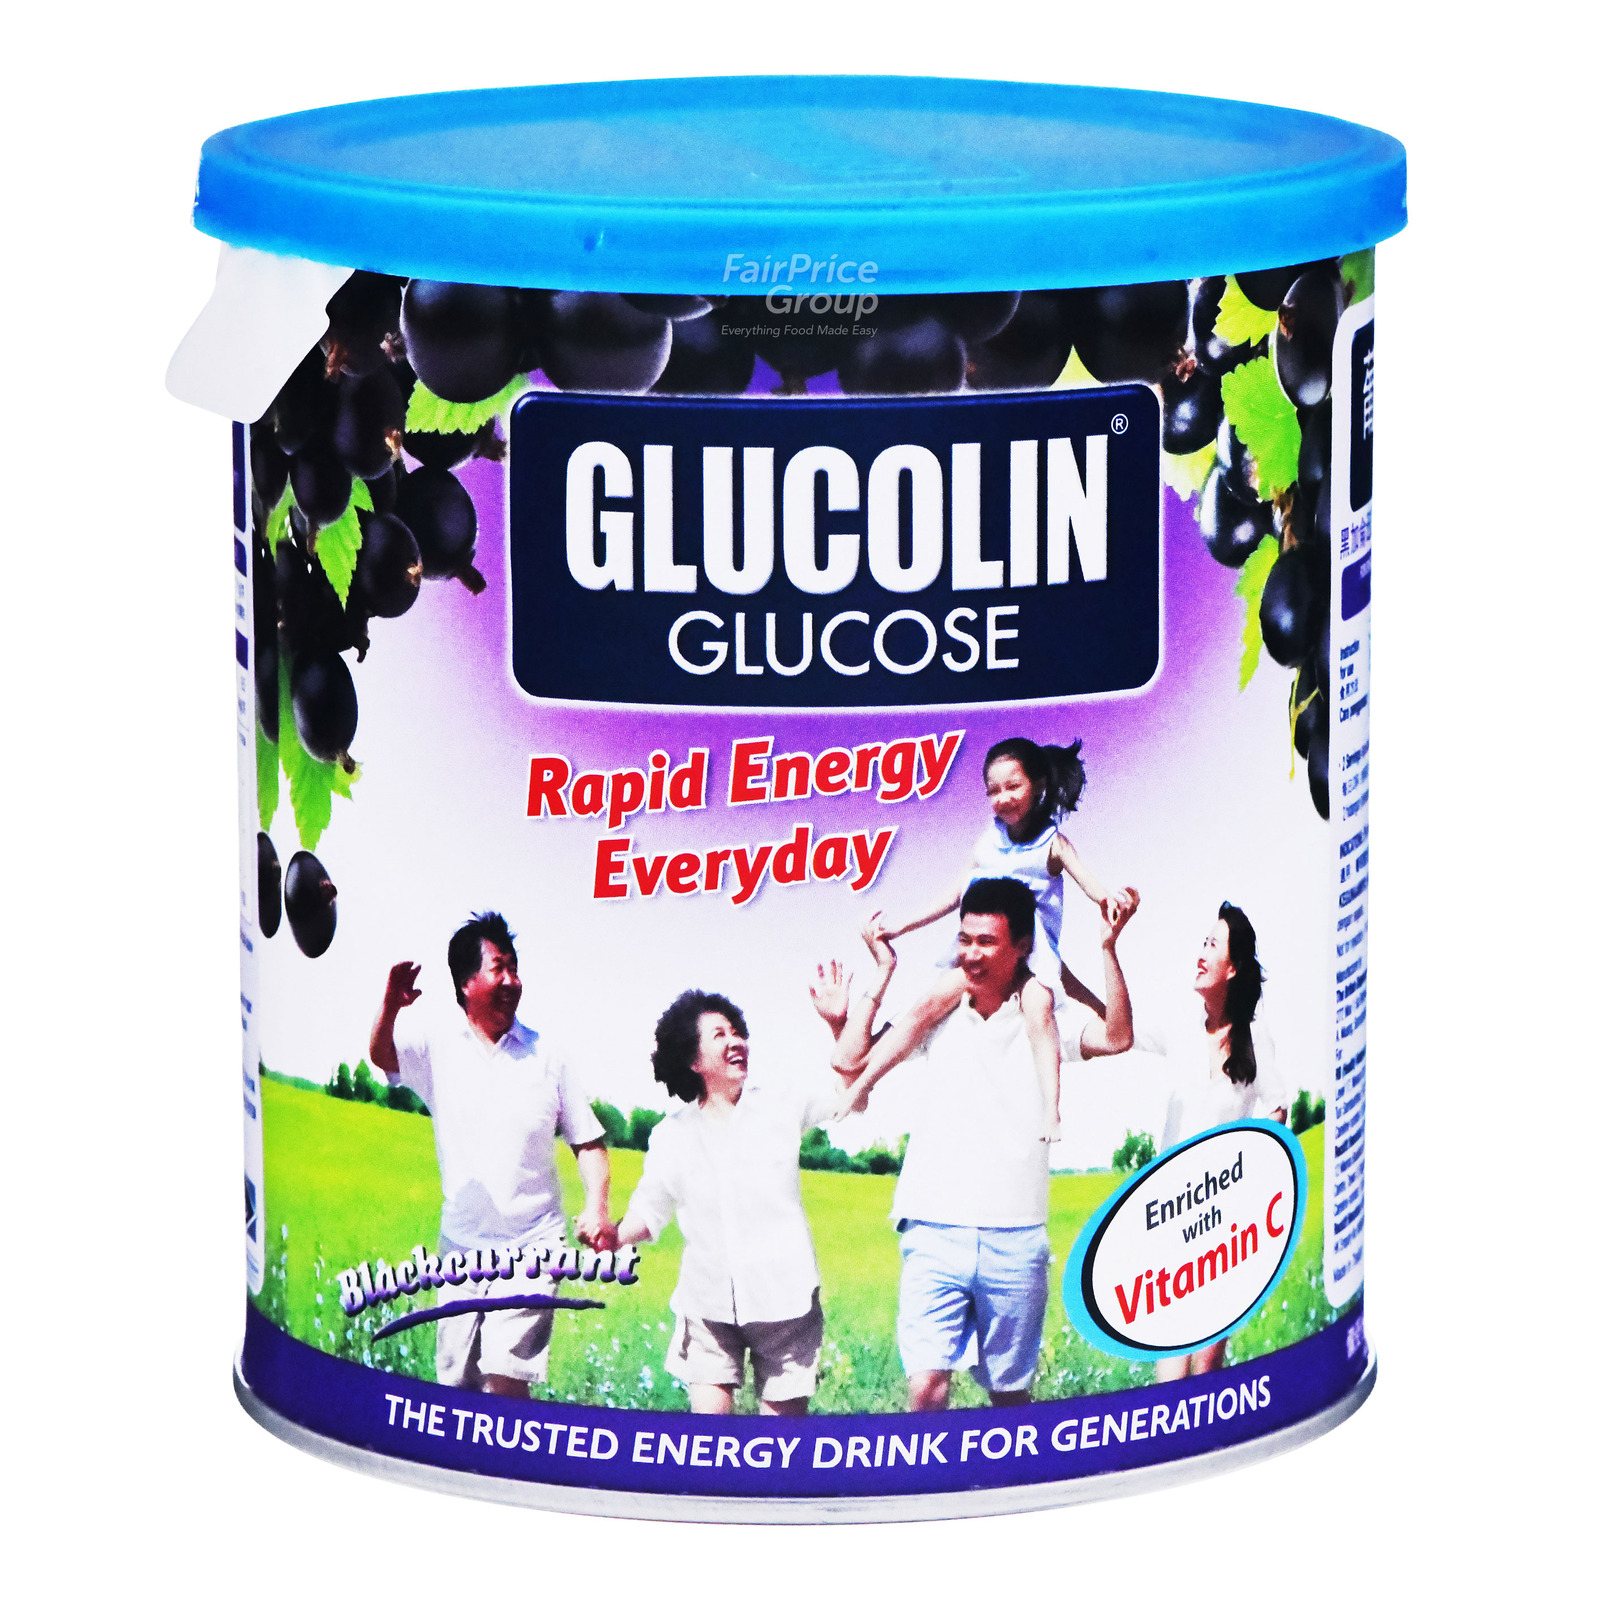 Glucolin Glucose - Blackcurrant